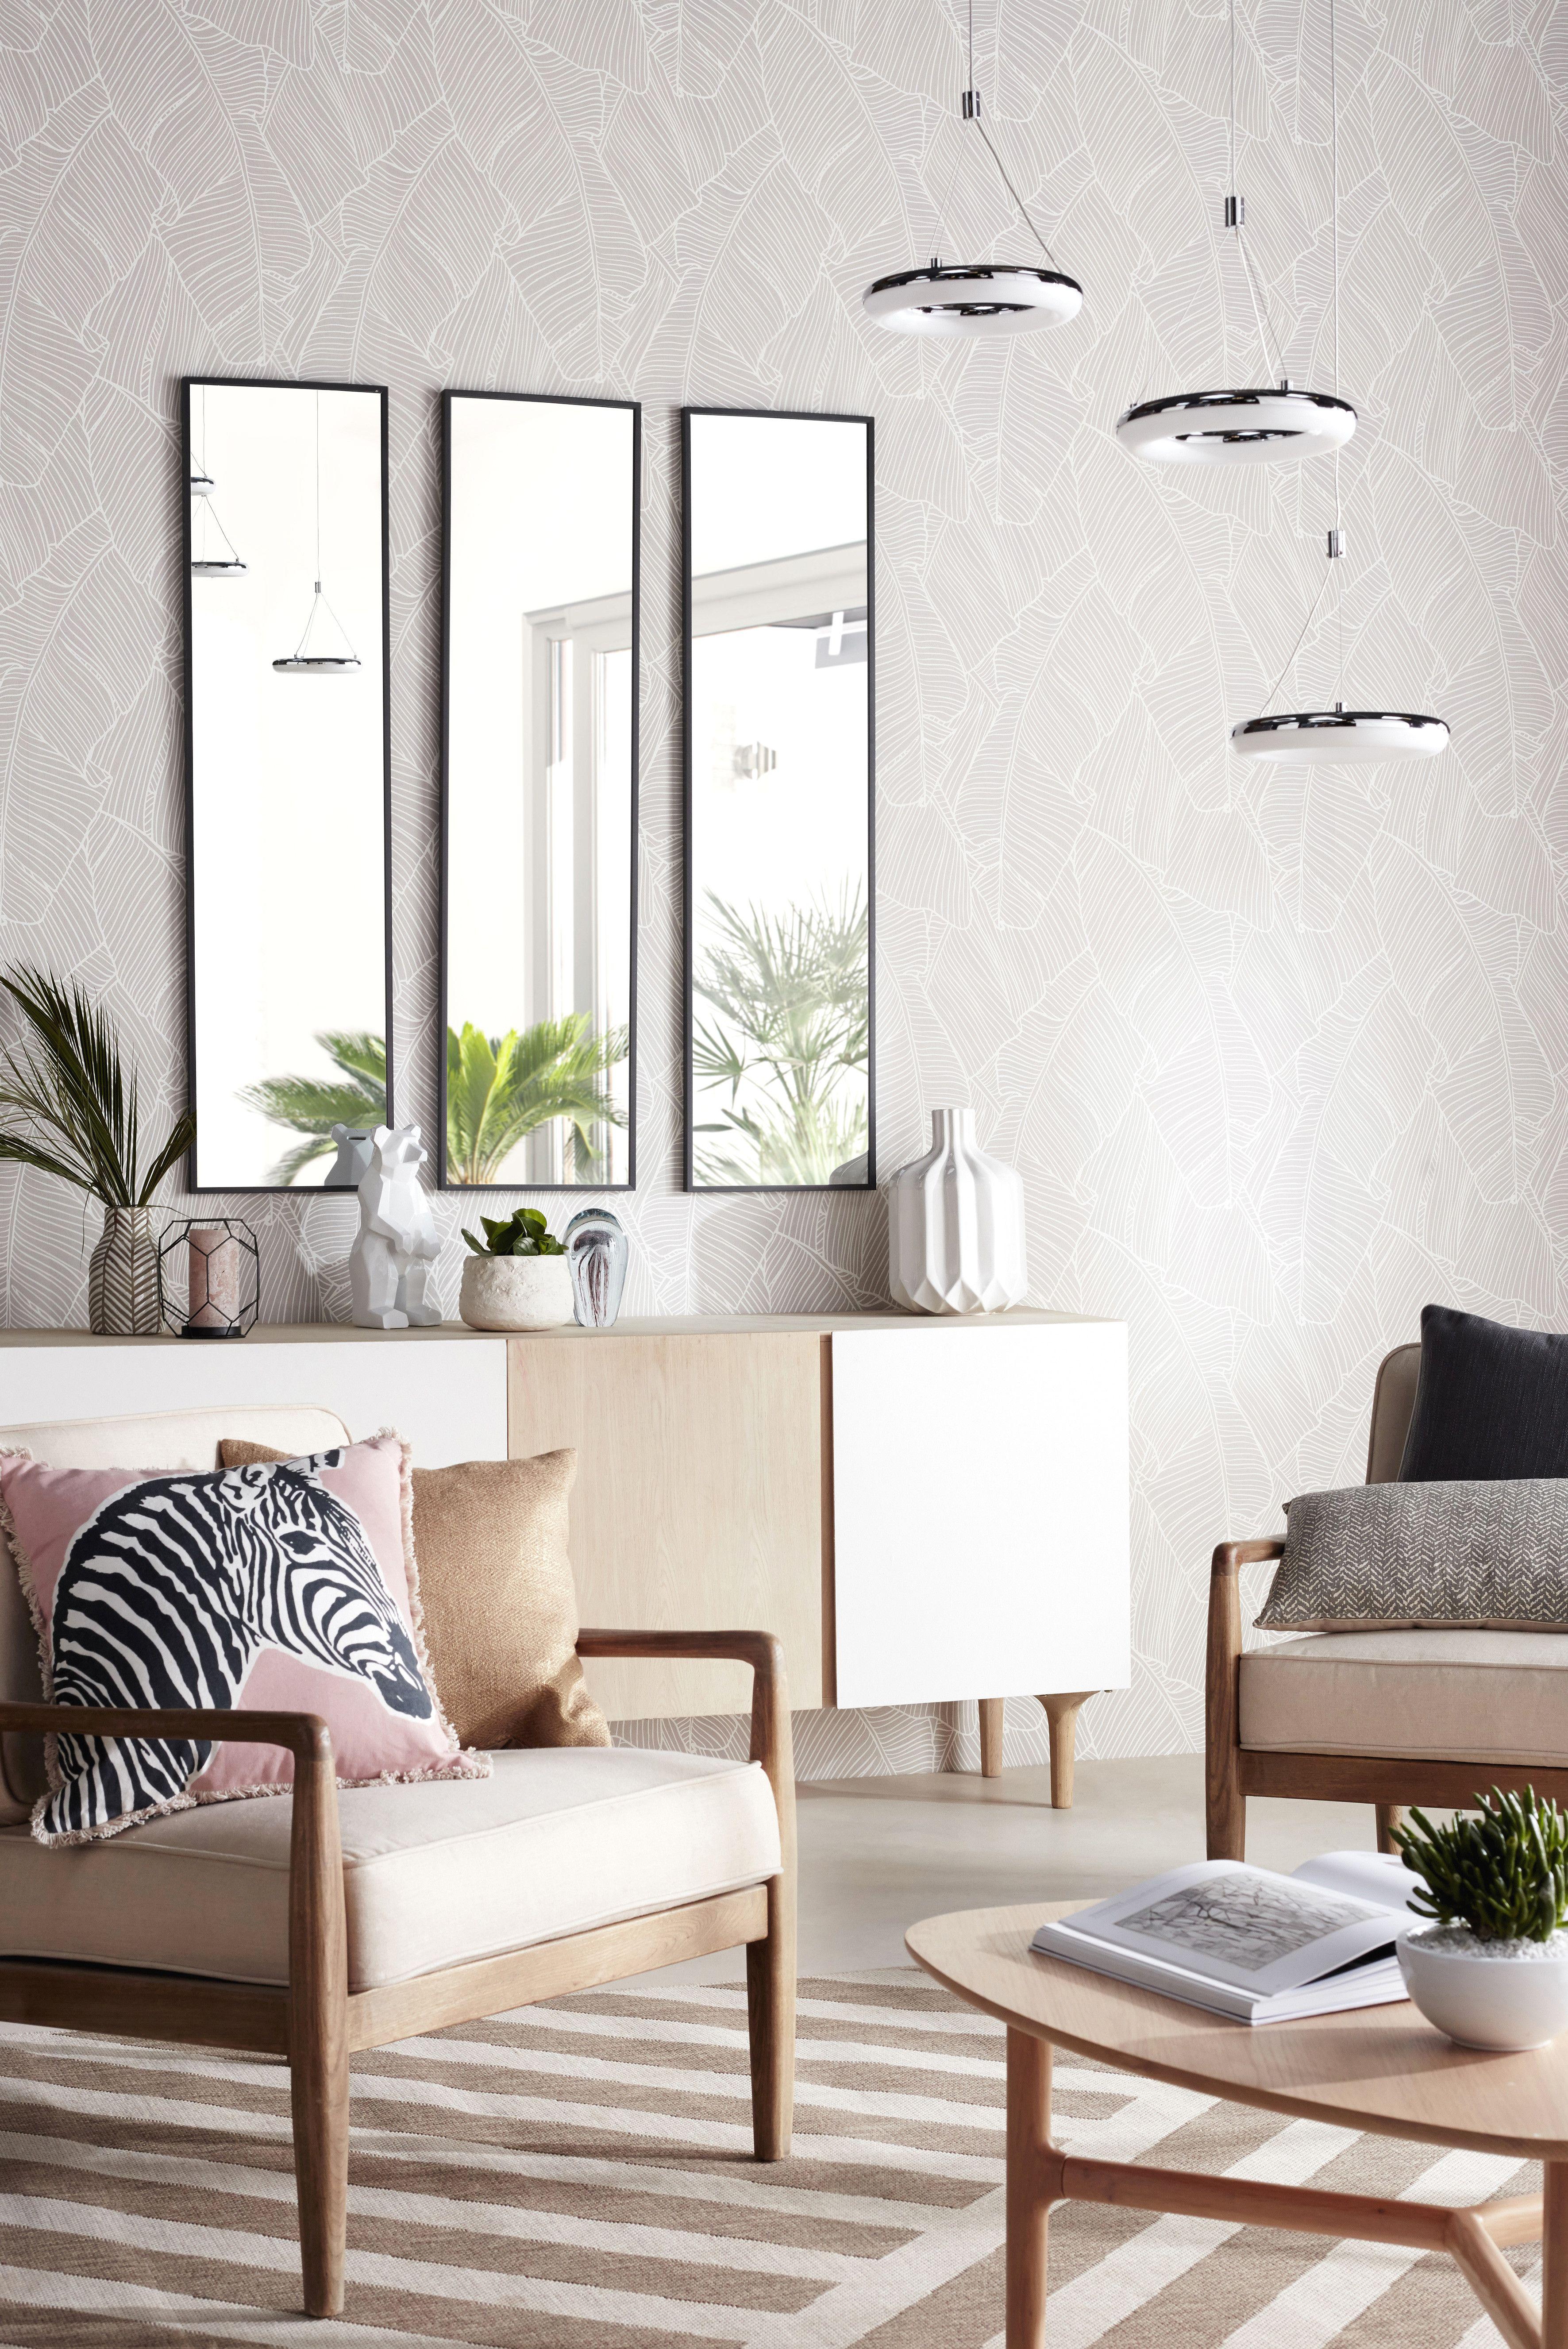 Idee Deco Miroir Adhesif Avec Miroir Linaria Noir 17 X 17 Cm Mur